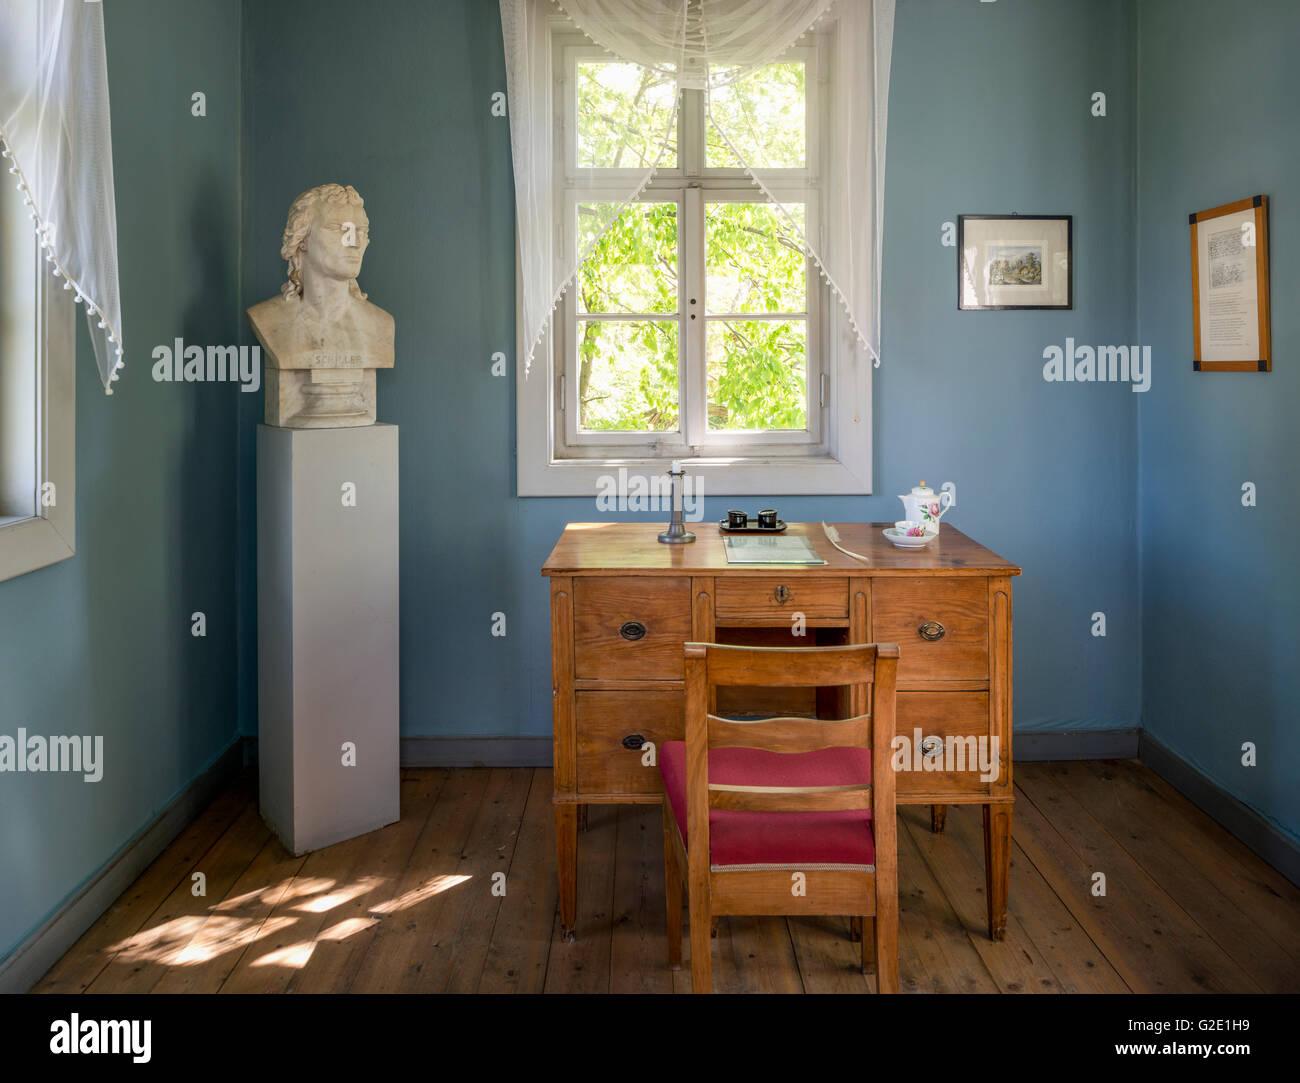 Dans l'étude de Schiller, Gartenzinne la maison du jardin de Friedrich Schiller, musée, Iéna, Photo Stock